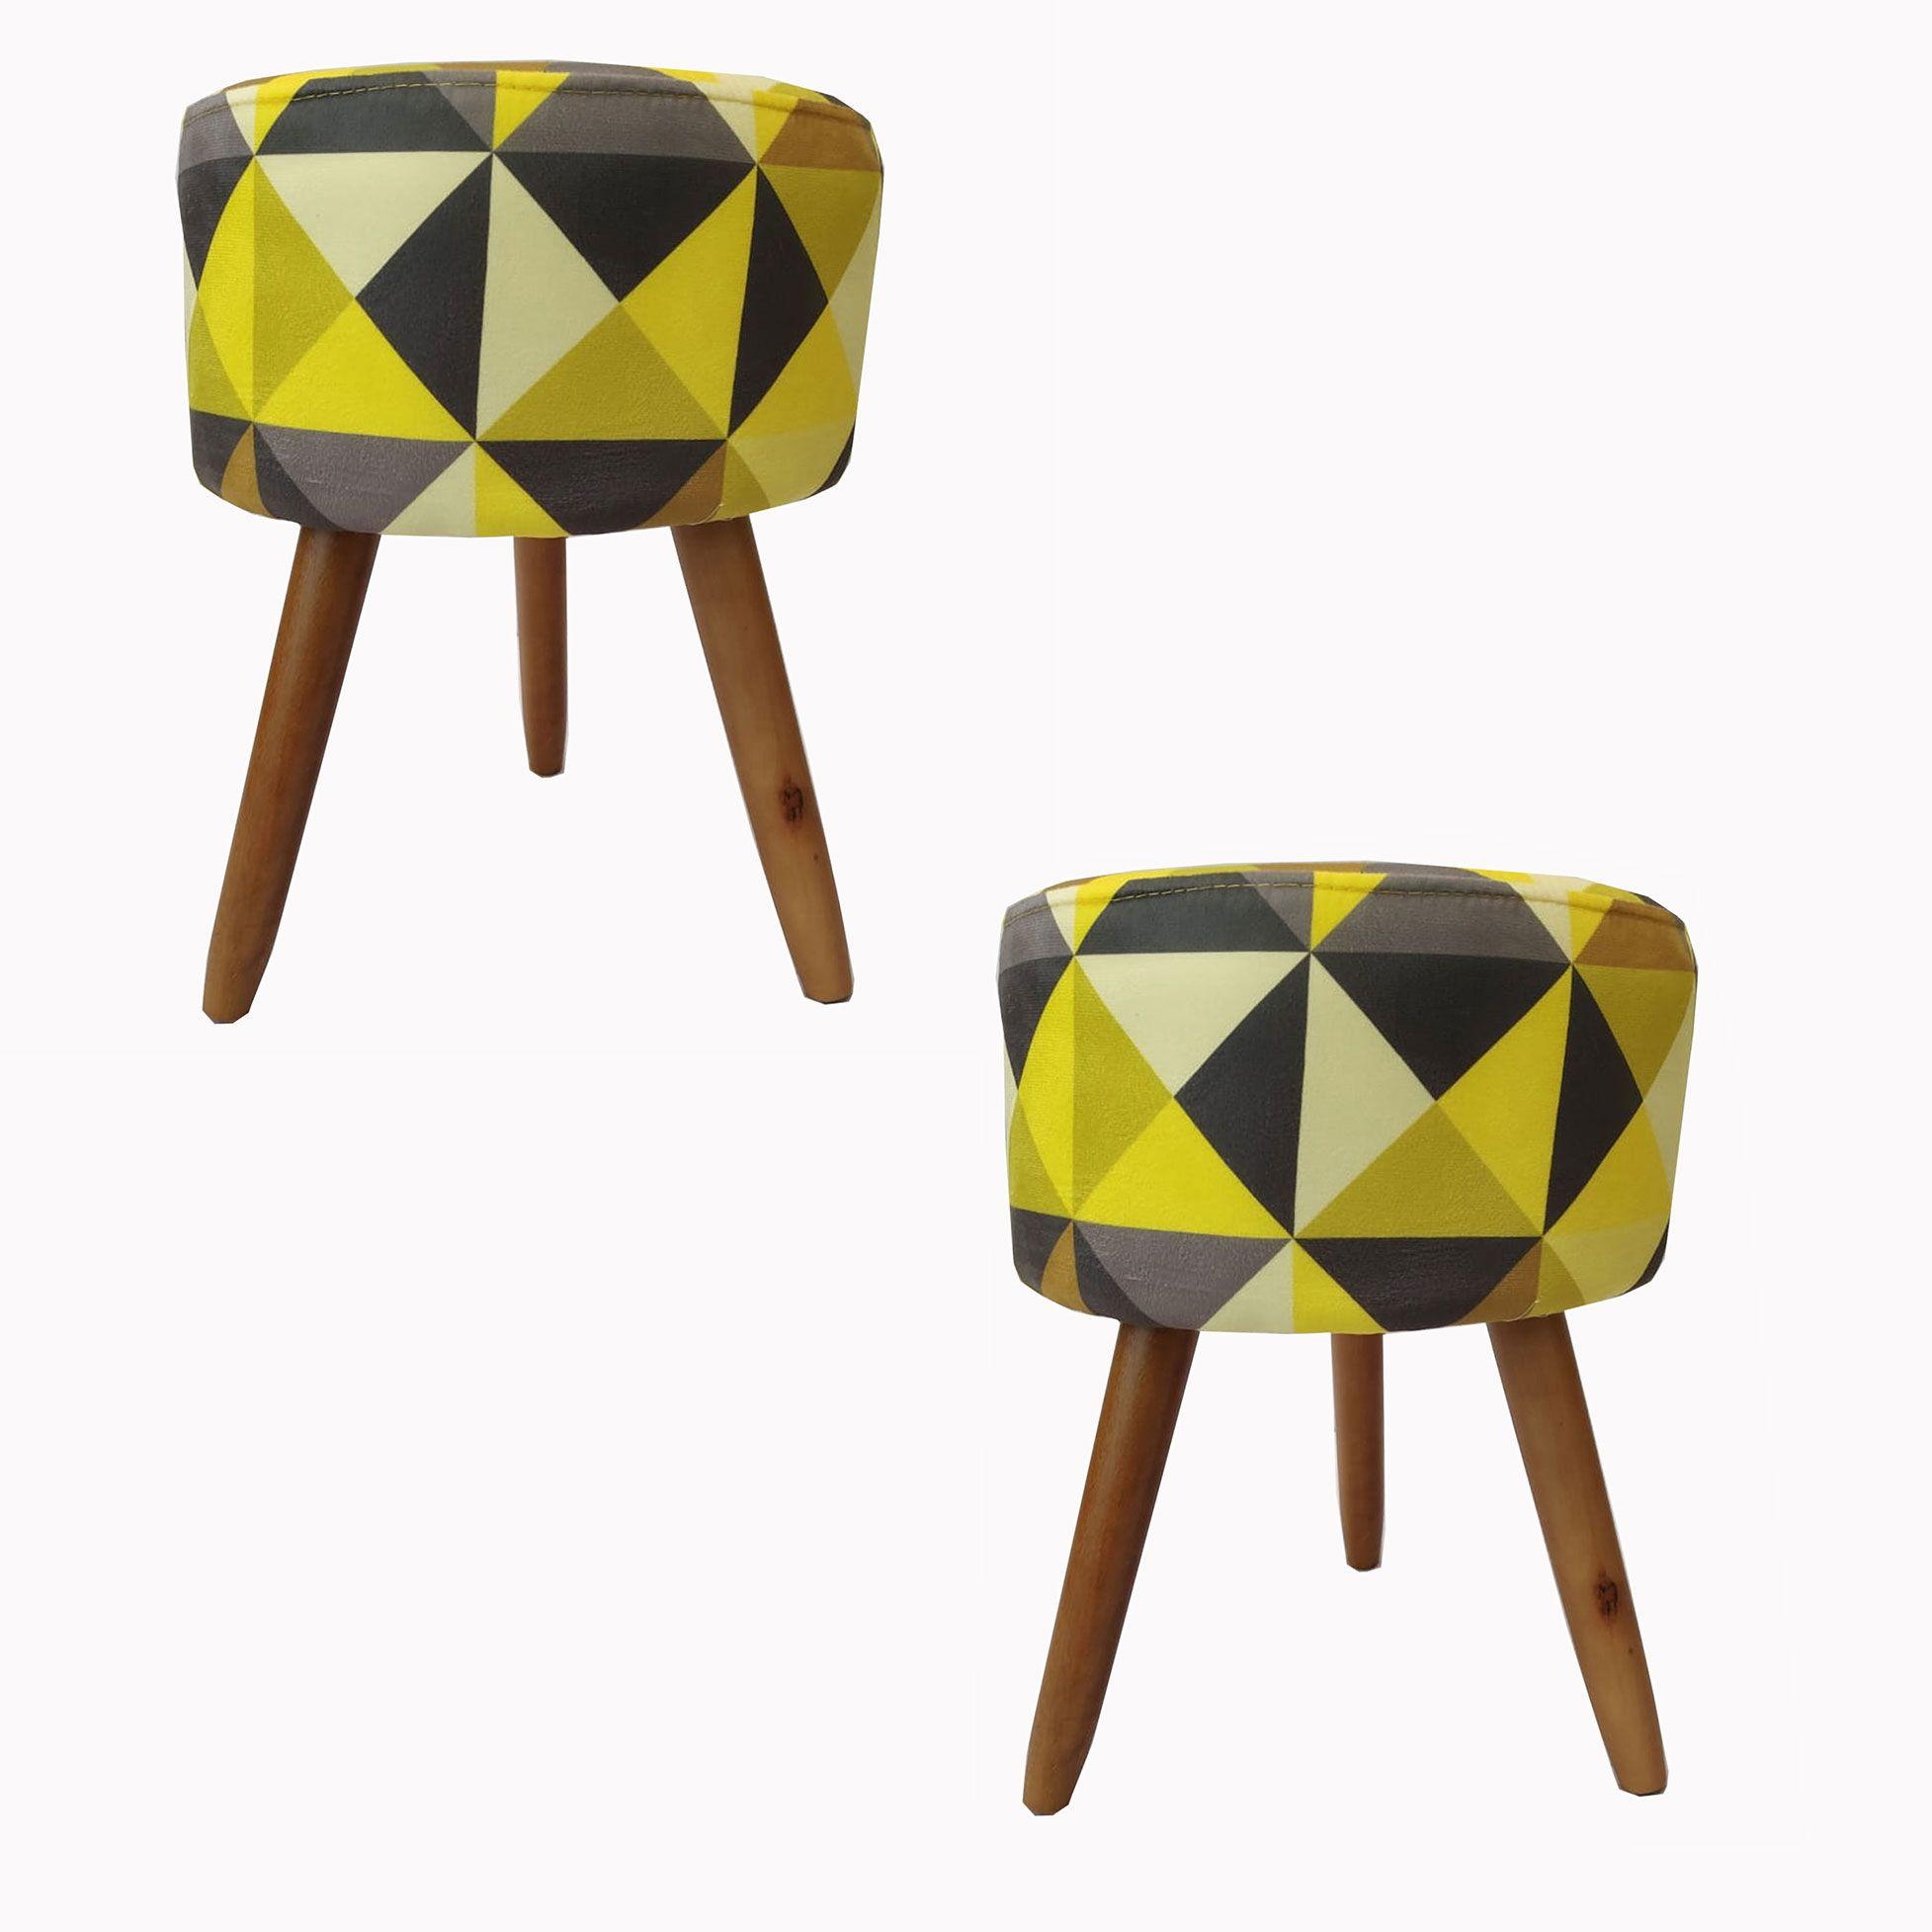 Kit 2 Puff Decorativos Milão Pé Palito Triângulos Amarelo